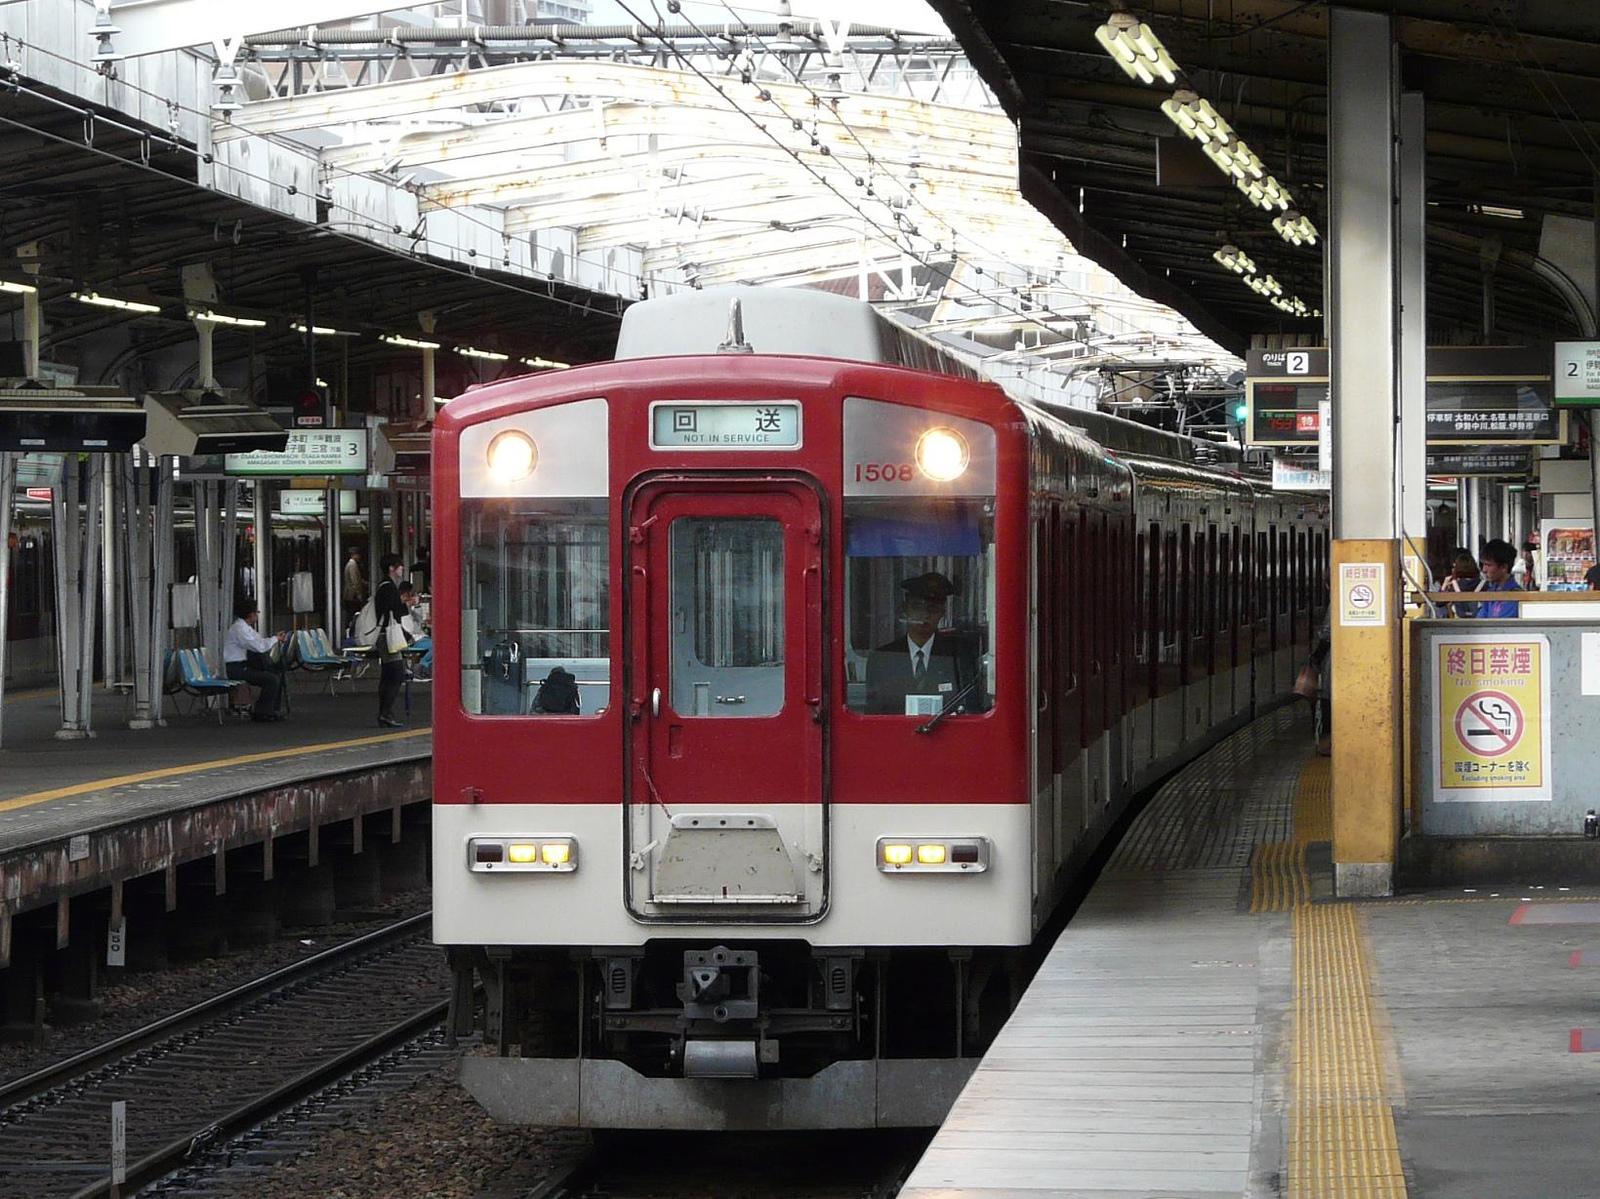 P1200742